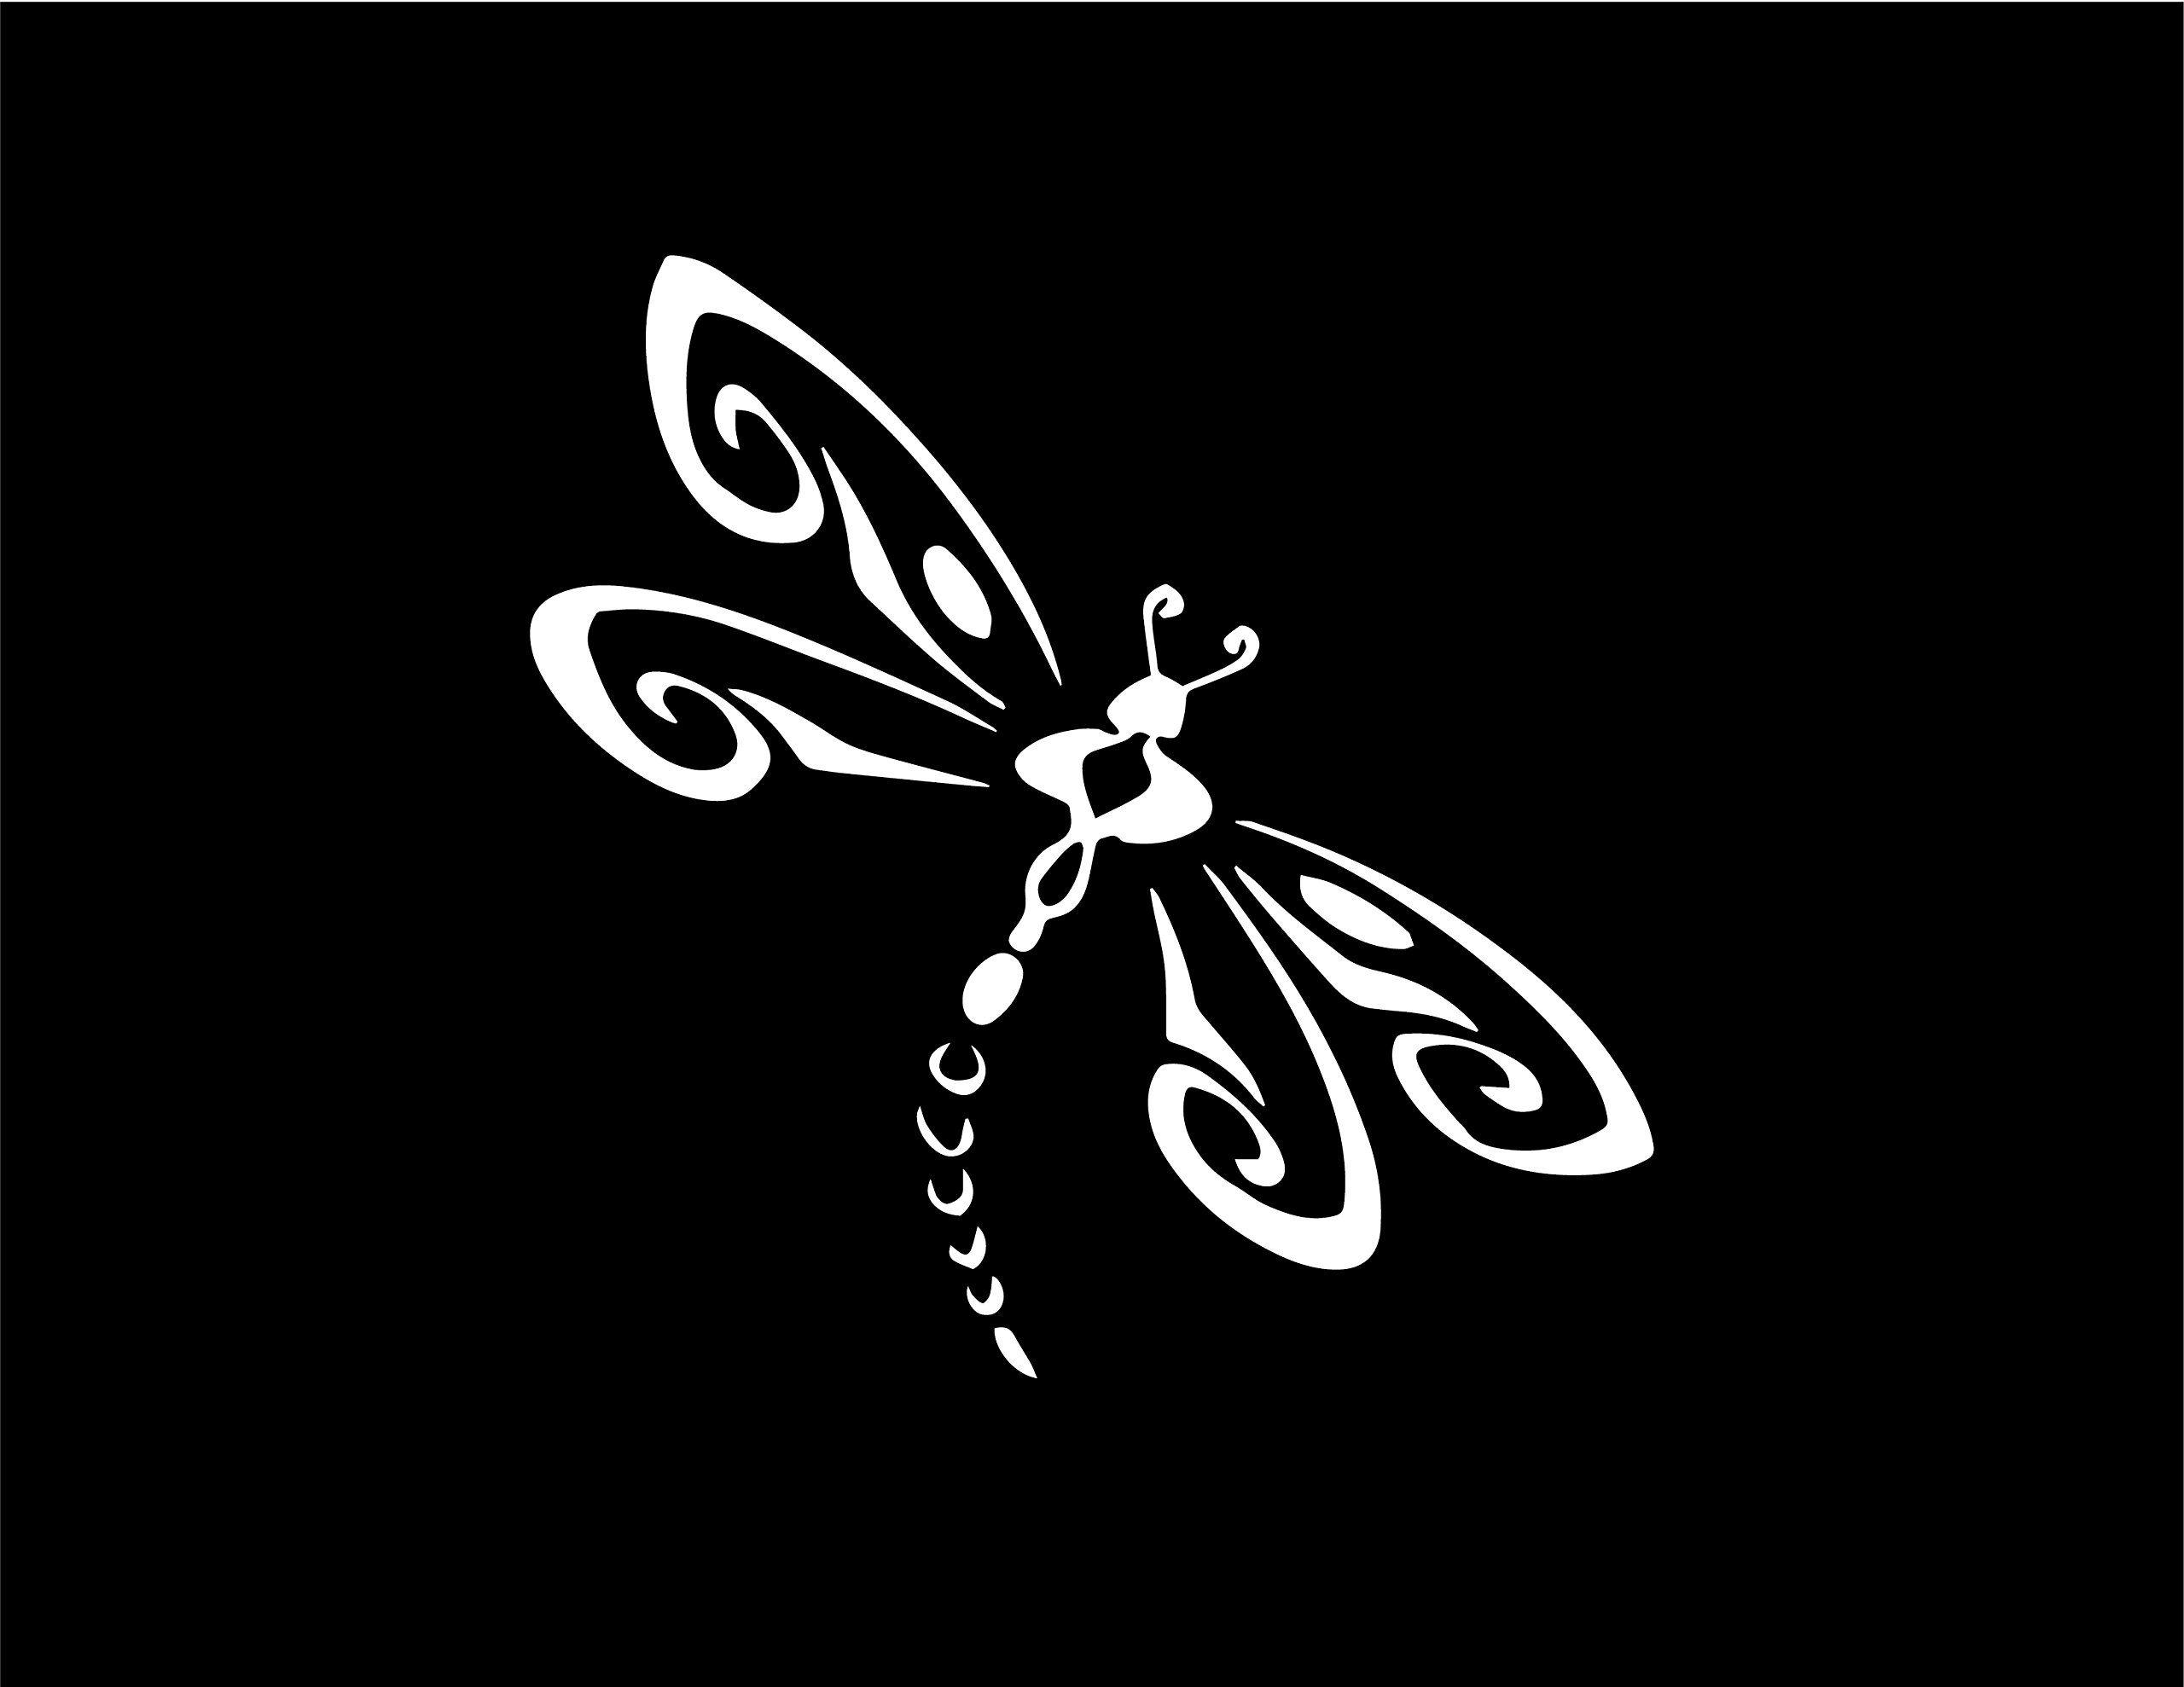 DRAGONFLY White 5 Vinyl STICKER//DECAL New